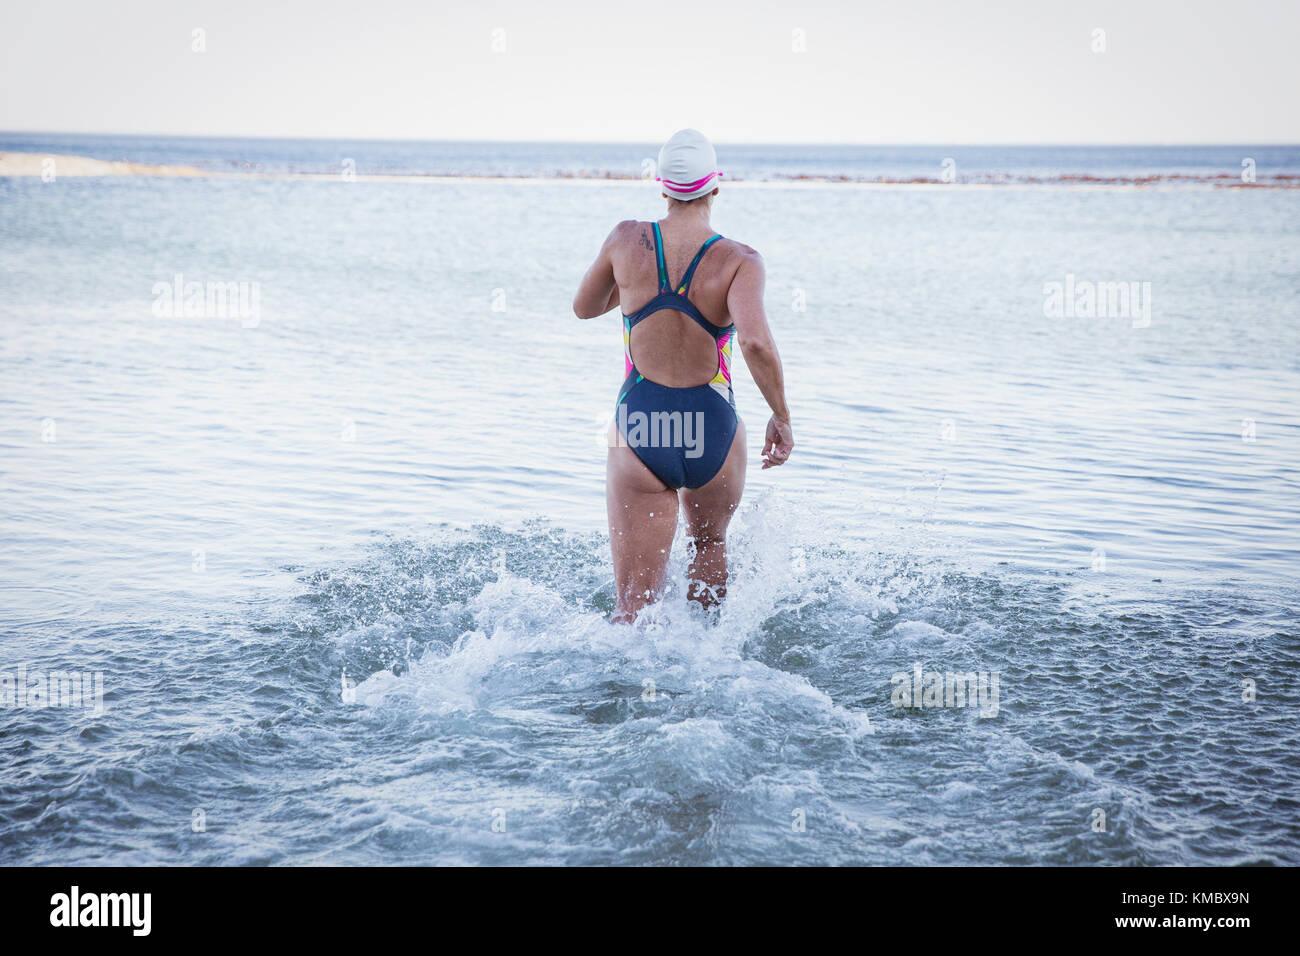 L'eau libre féminin en nageur Océan surf Photo Stock